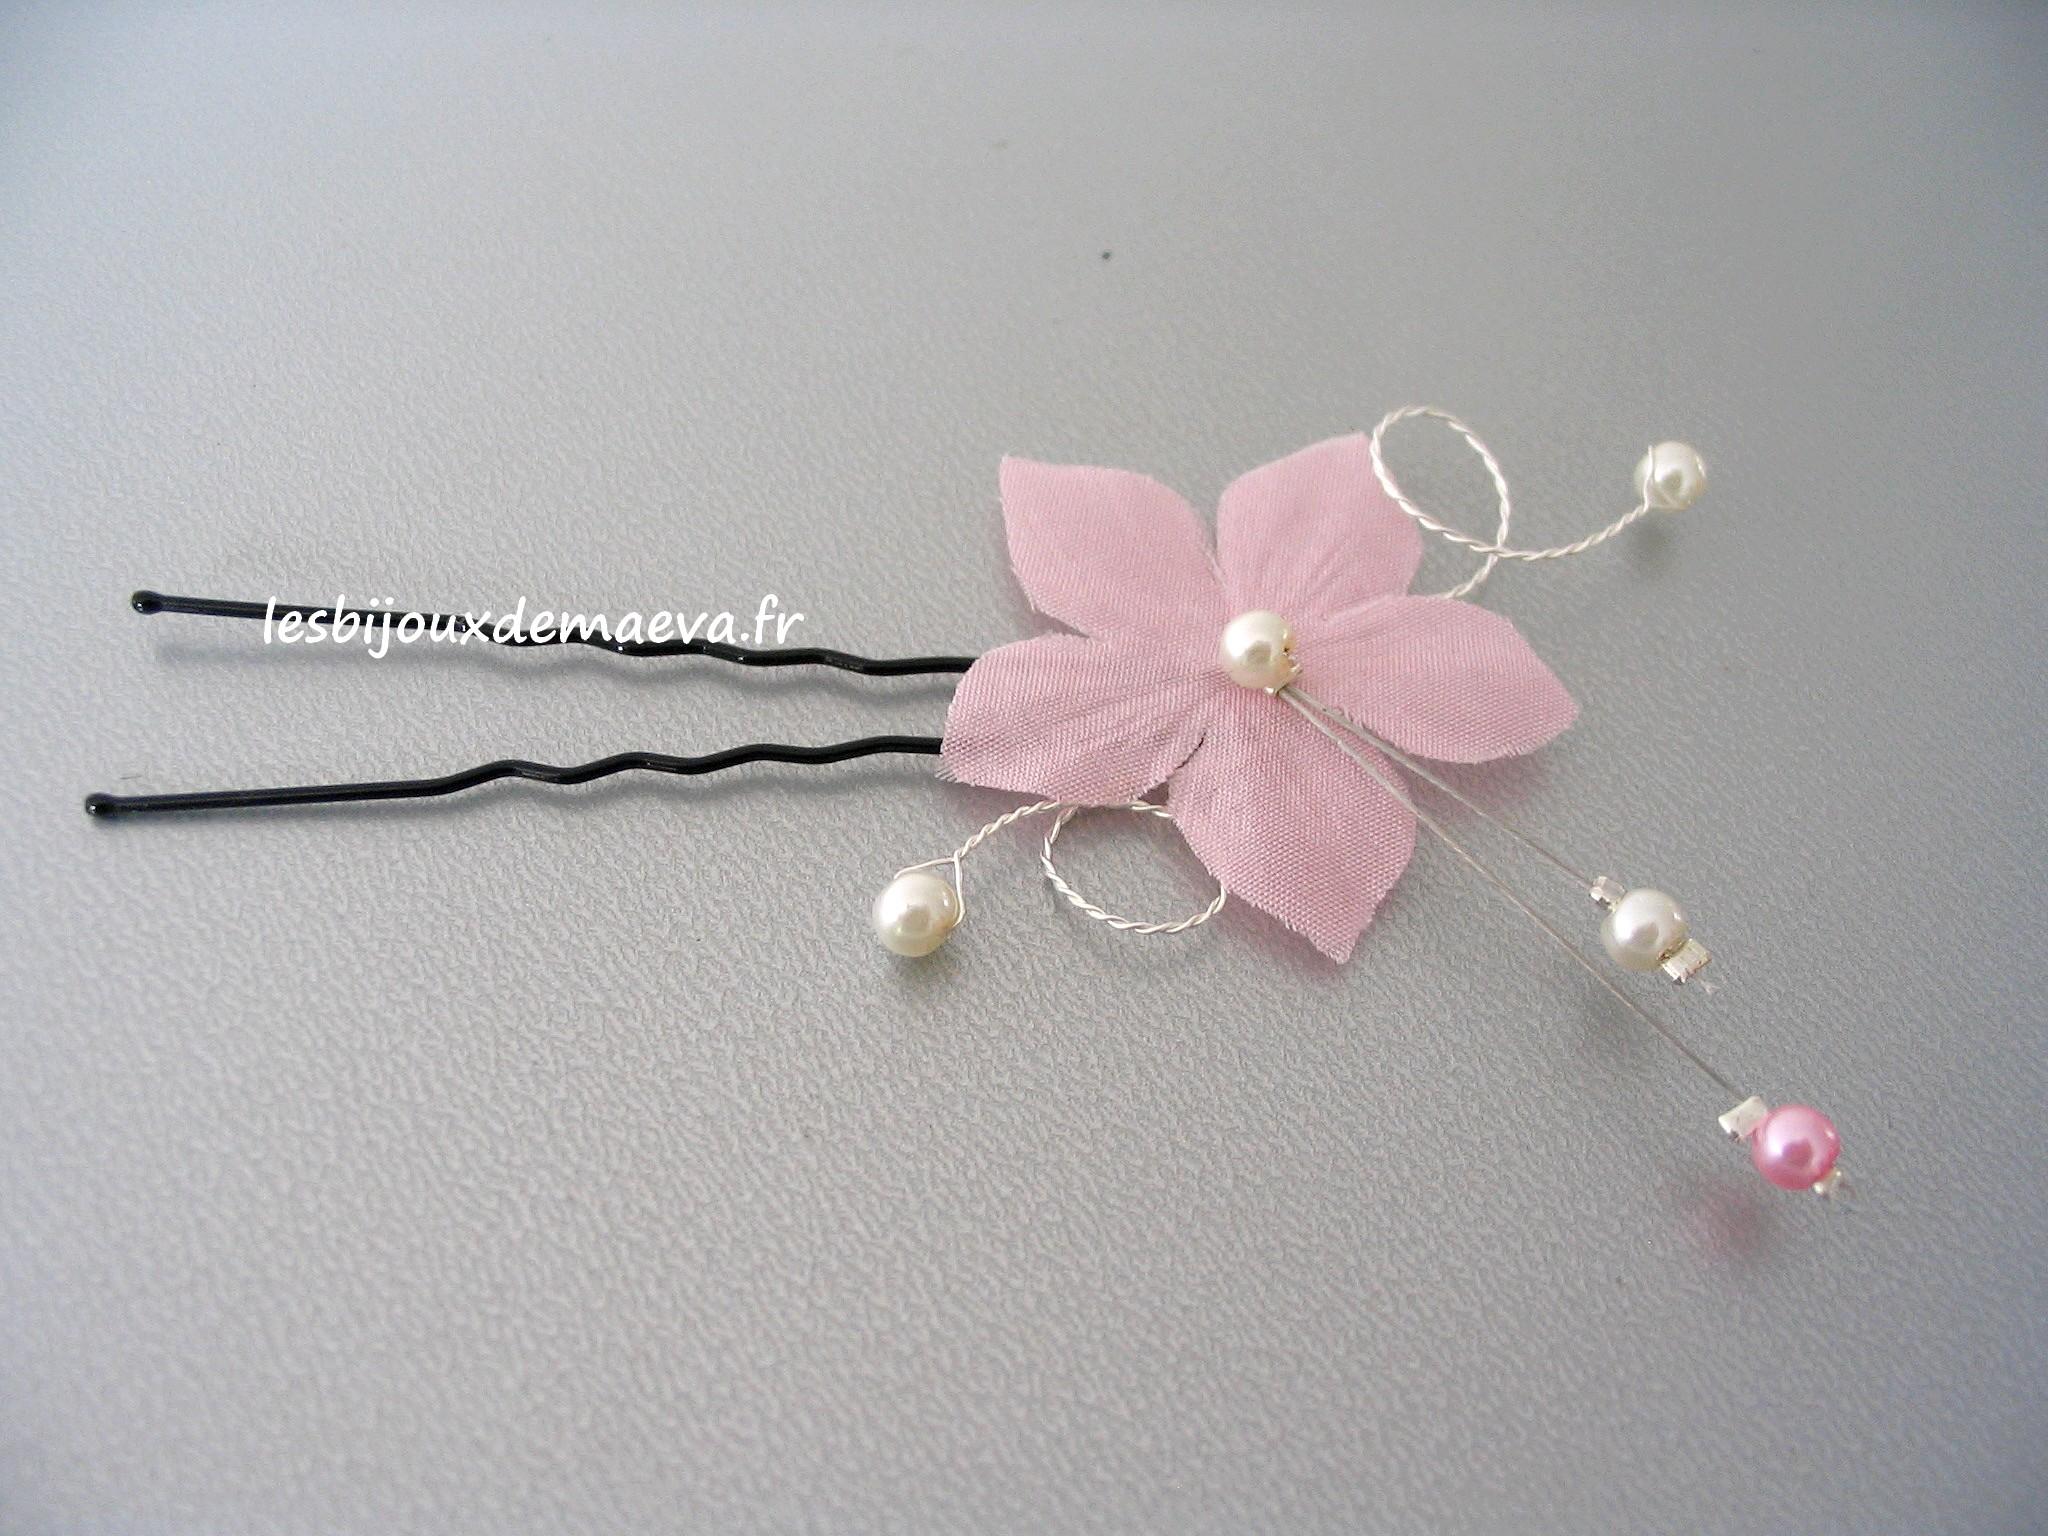 fleur cheveux mariage rose poudr radieuse. Black Bedroom Furniture Sets. Home Design Ideas